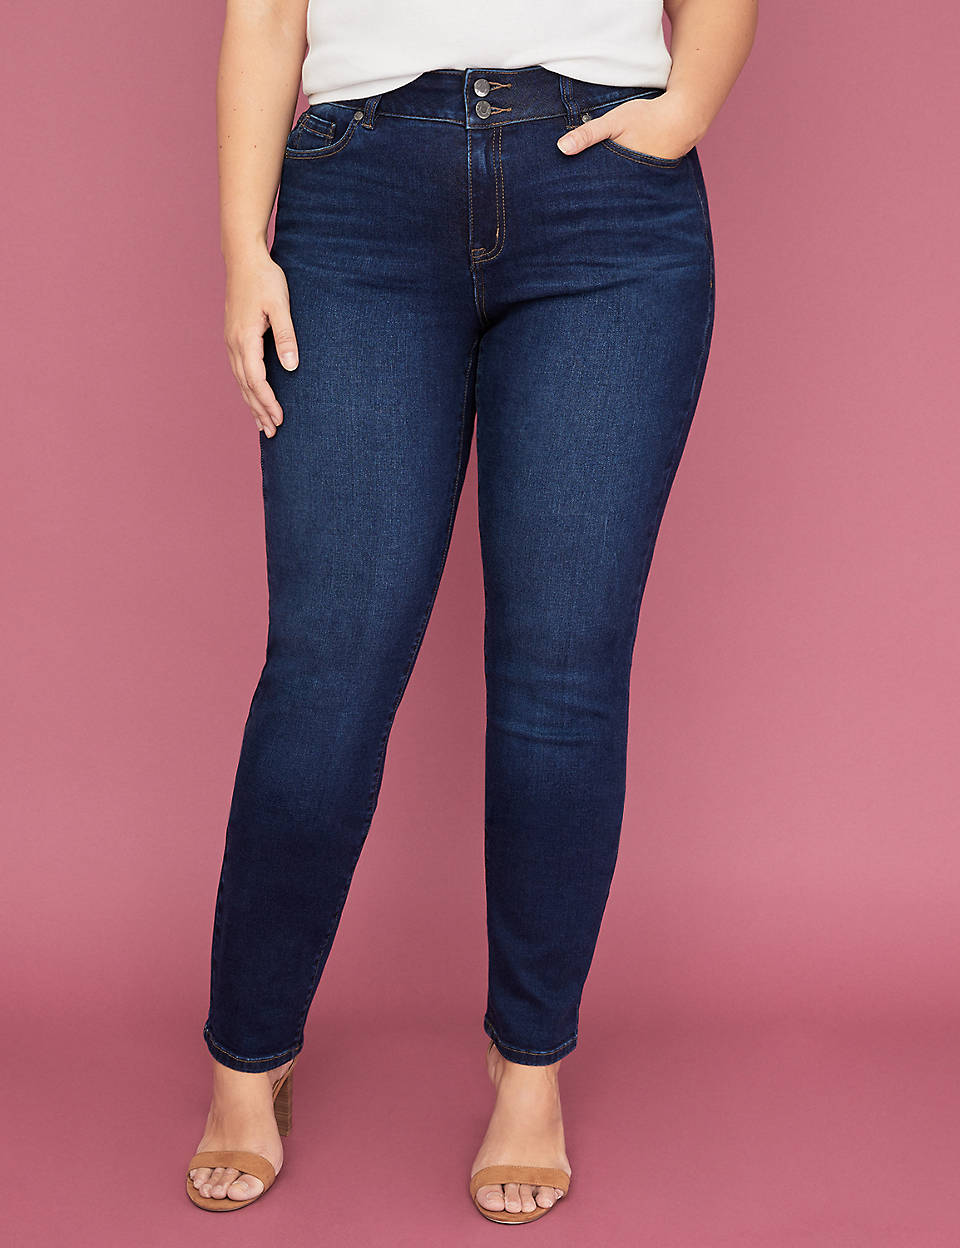 1dea2d9d7c0c9 Tighter Tummy Essential Stretch Straight Jean - Dark Wash